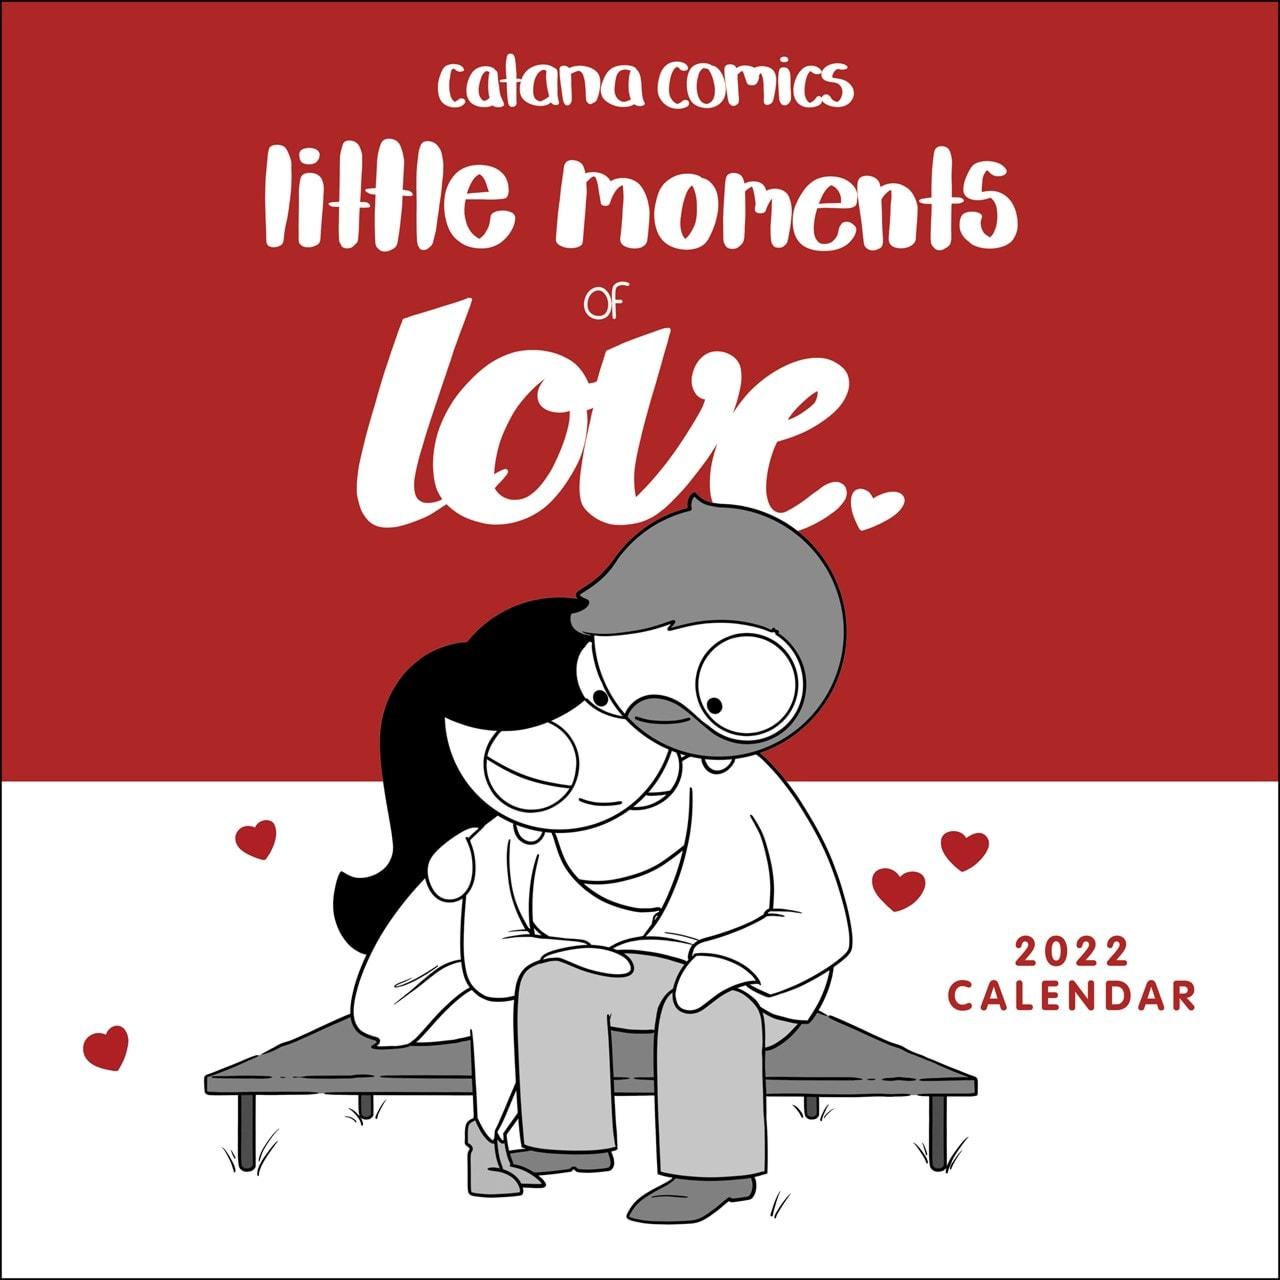 Catana Comics: Little Moments of Love Square 2022 Calendar - 1